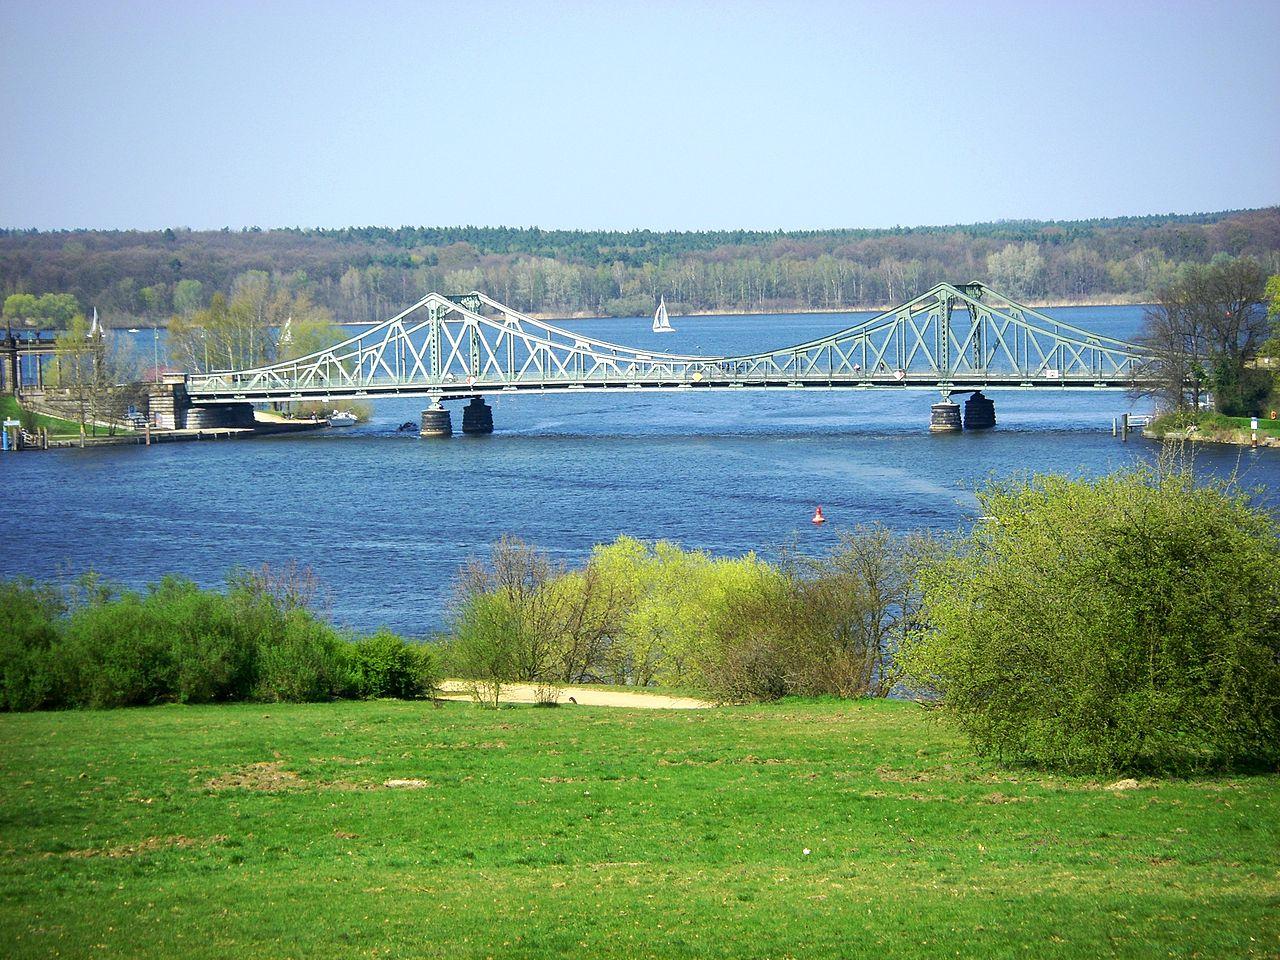 Bild Glienicker Brücke Potsdam